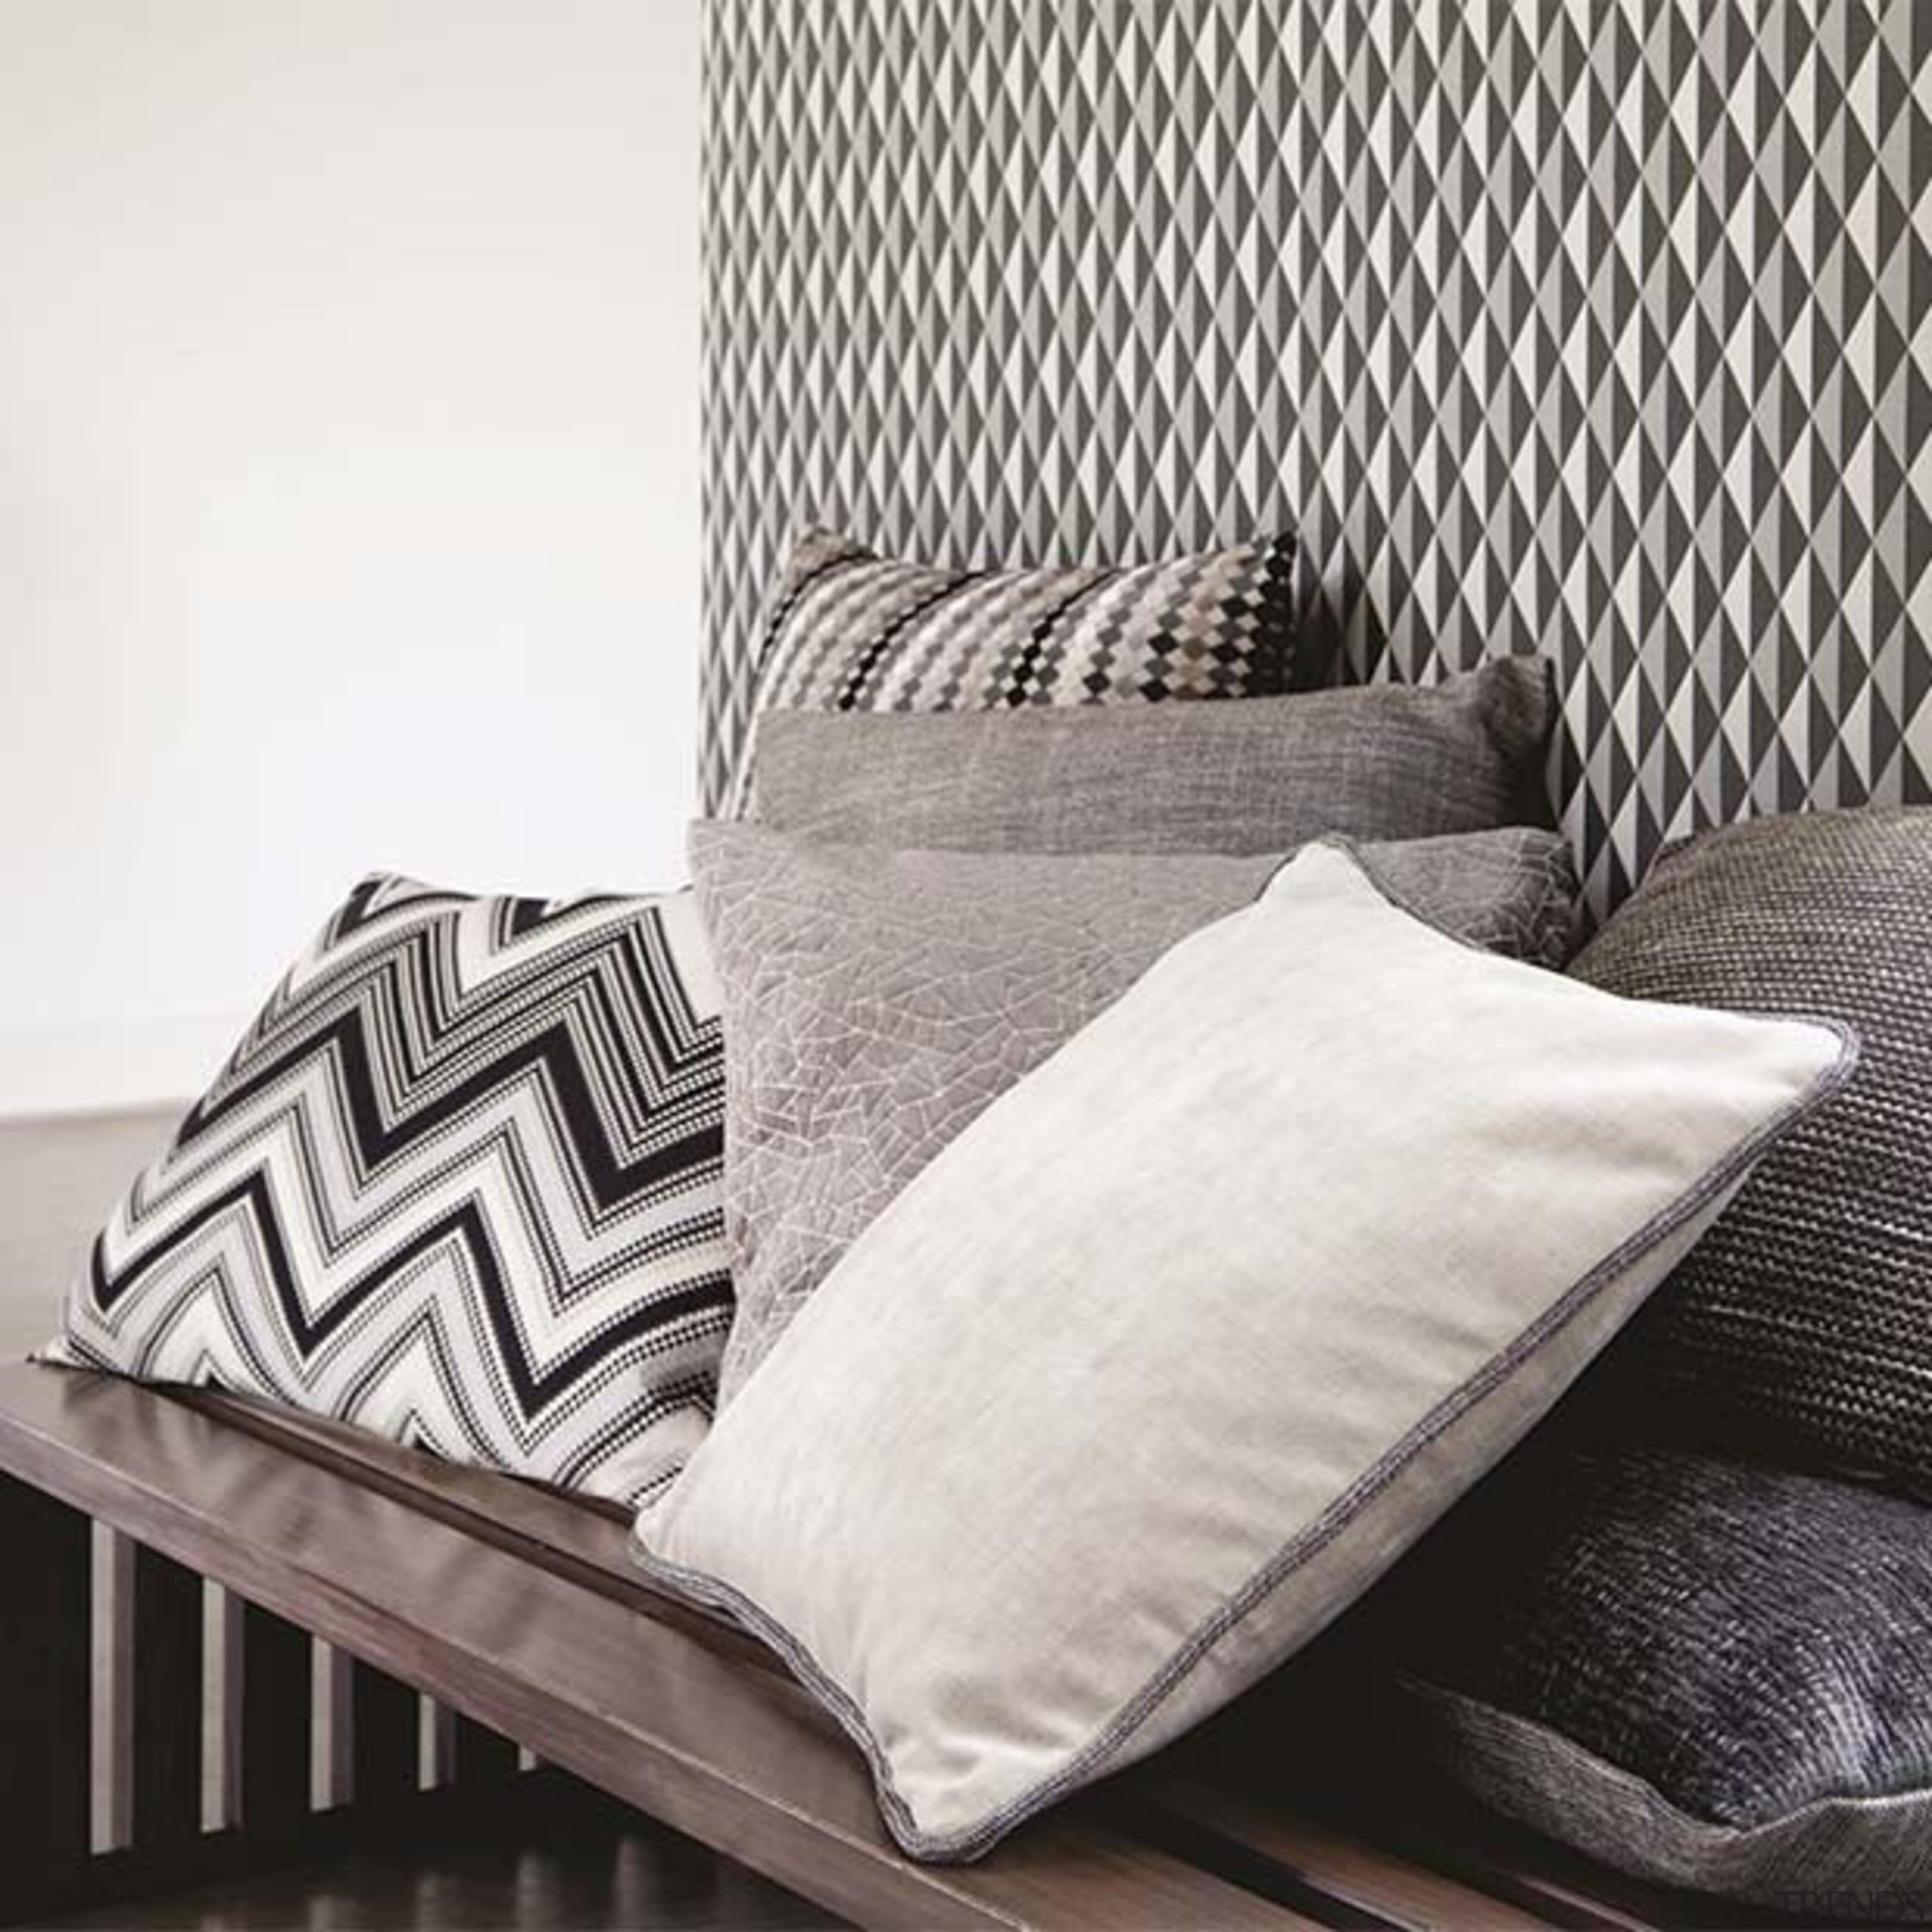 Kaleidoscope 7 - Kaleidoscope 7 - bed | bed, bed frame, bed sheet, black and white, cushion, duvet cover, furniture, linens, mattress, pillow, product, textile, white